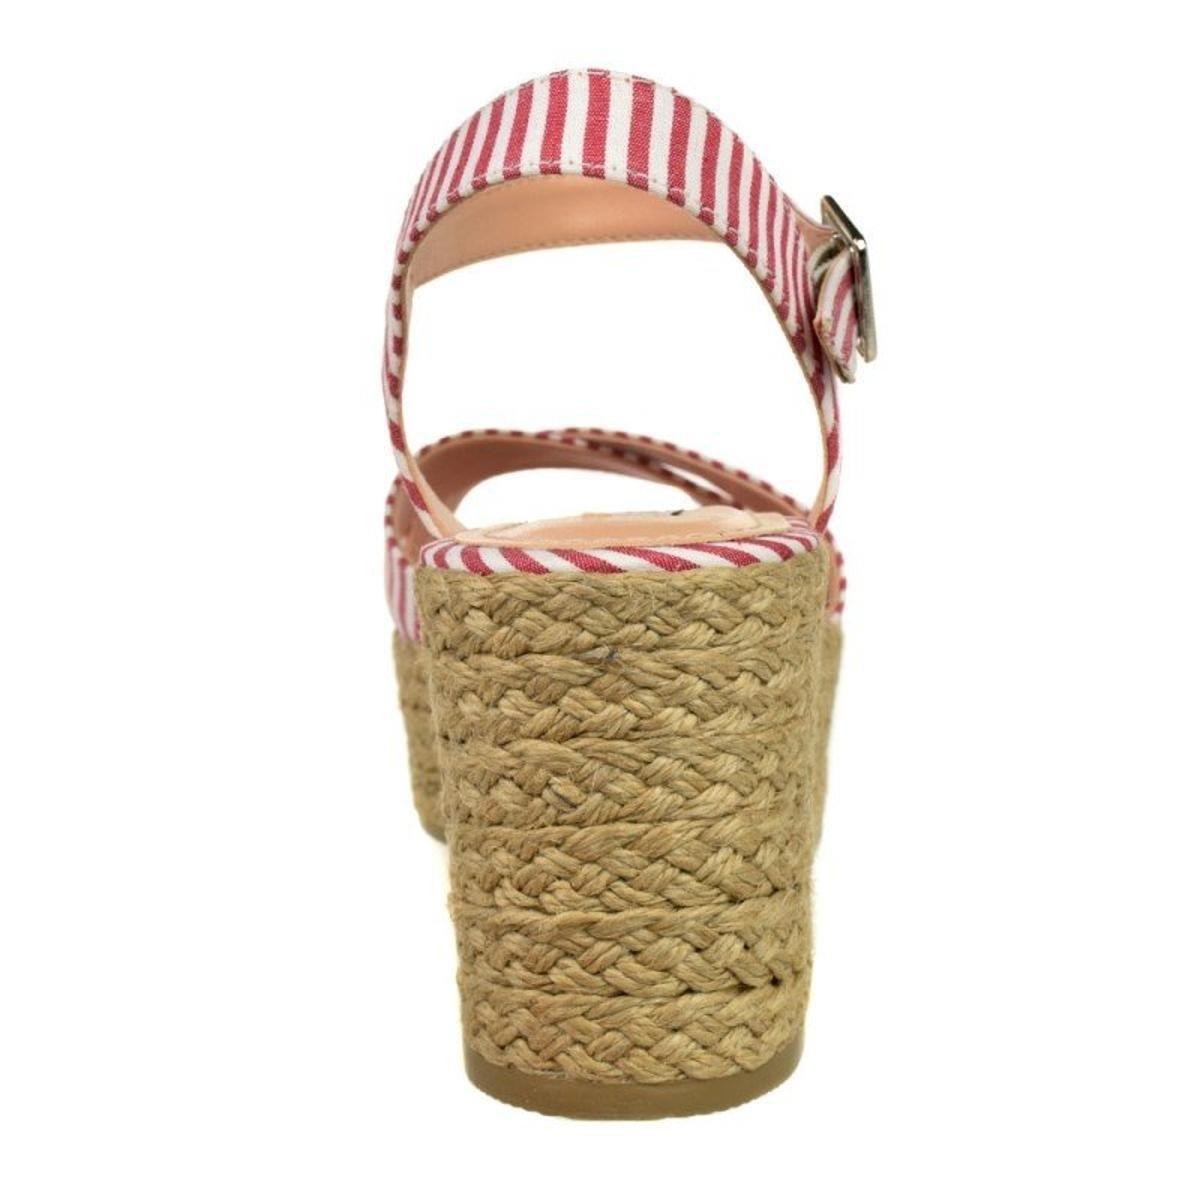 acessórios feminina femininos Lia feminina acessórios Vermelho Line sandália sandália qtAP7AHcwI